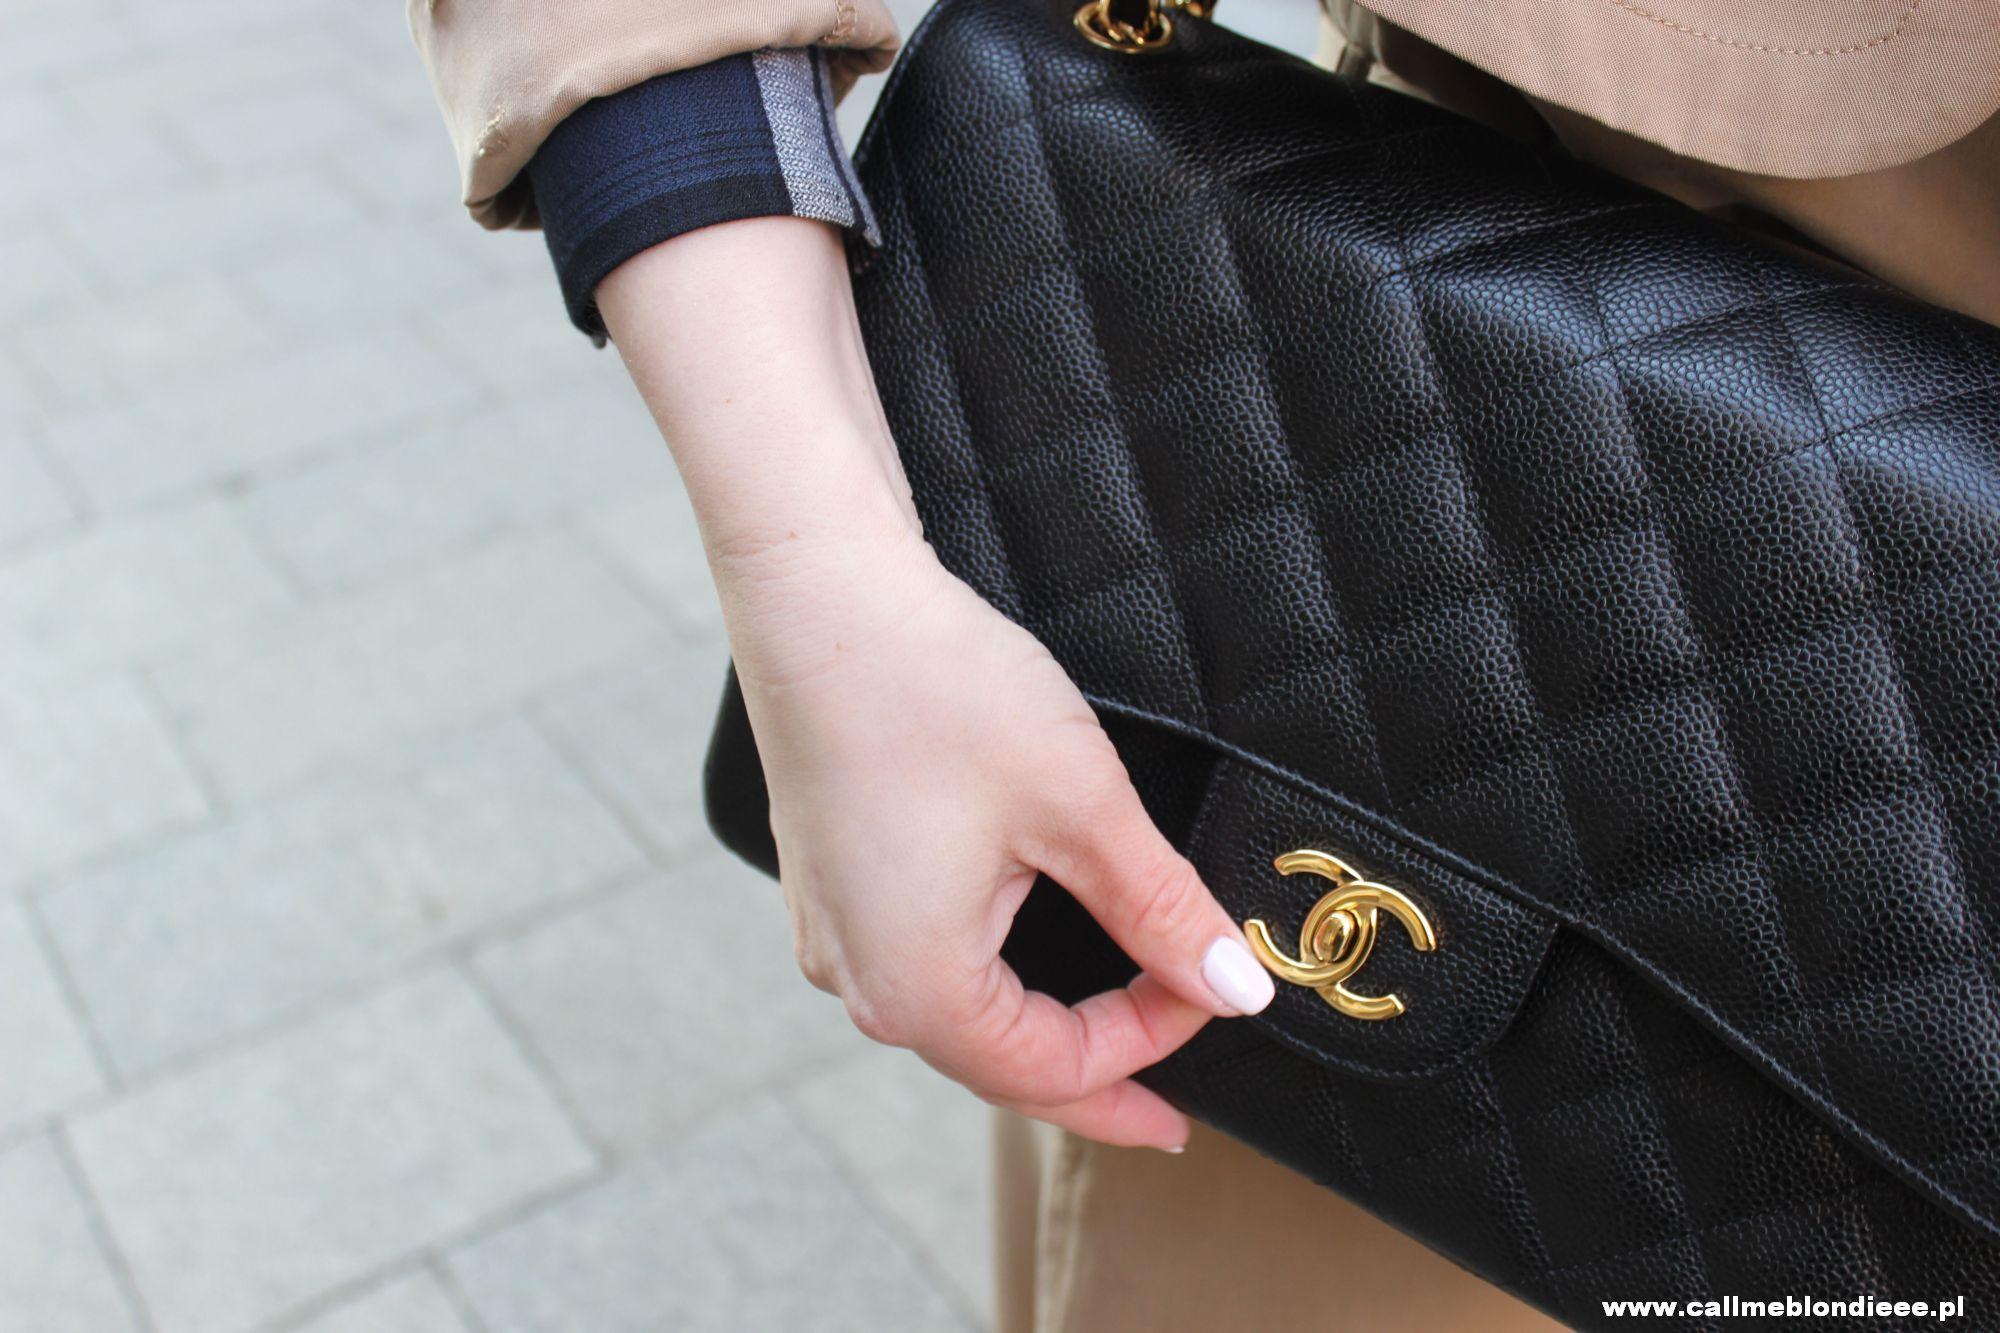 OOTD - Classic Look & Classic Bag 1